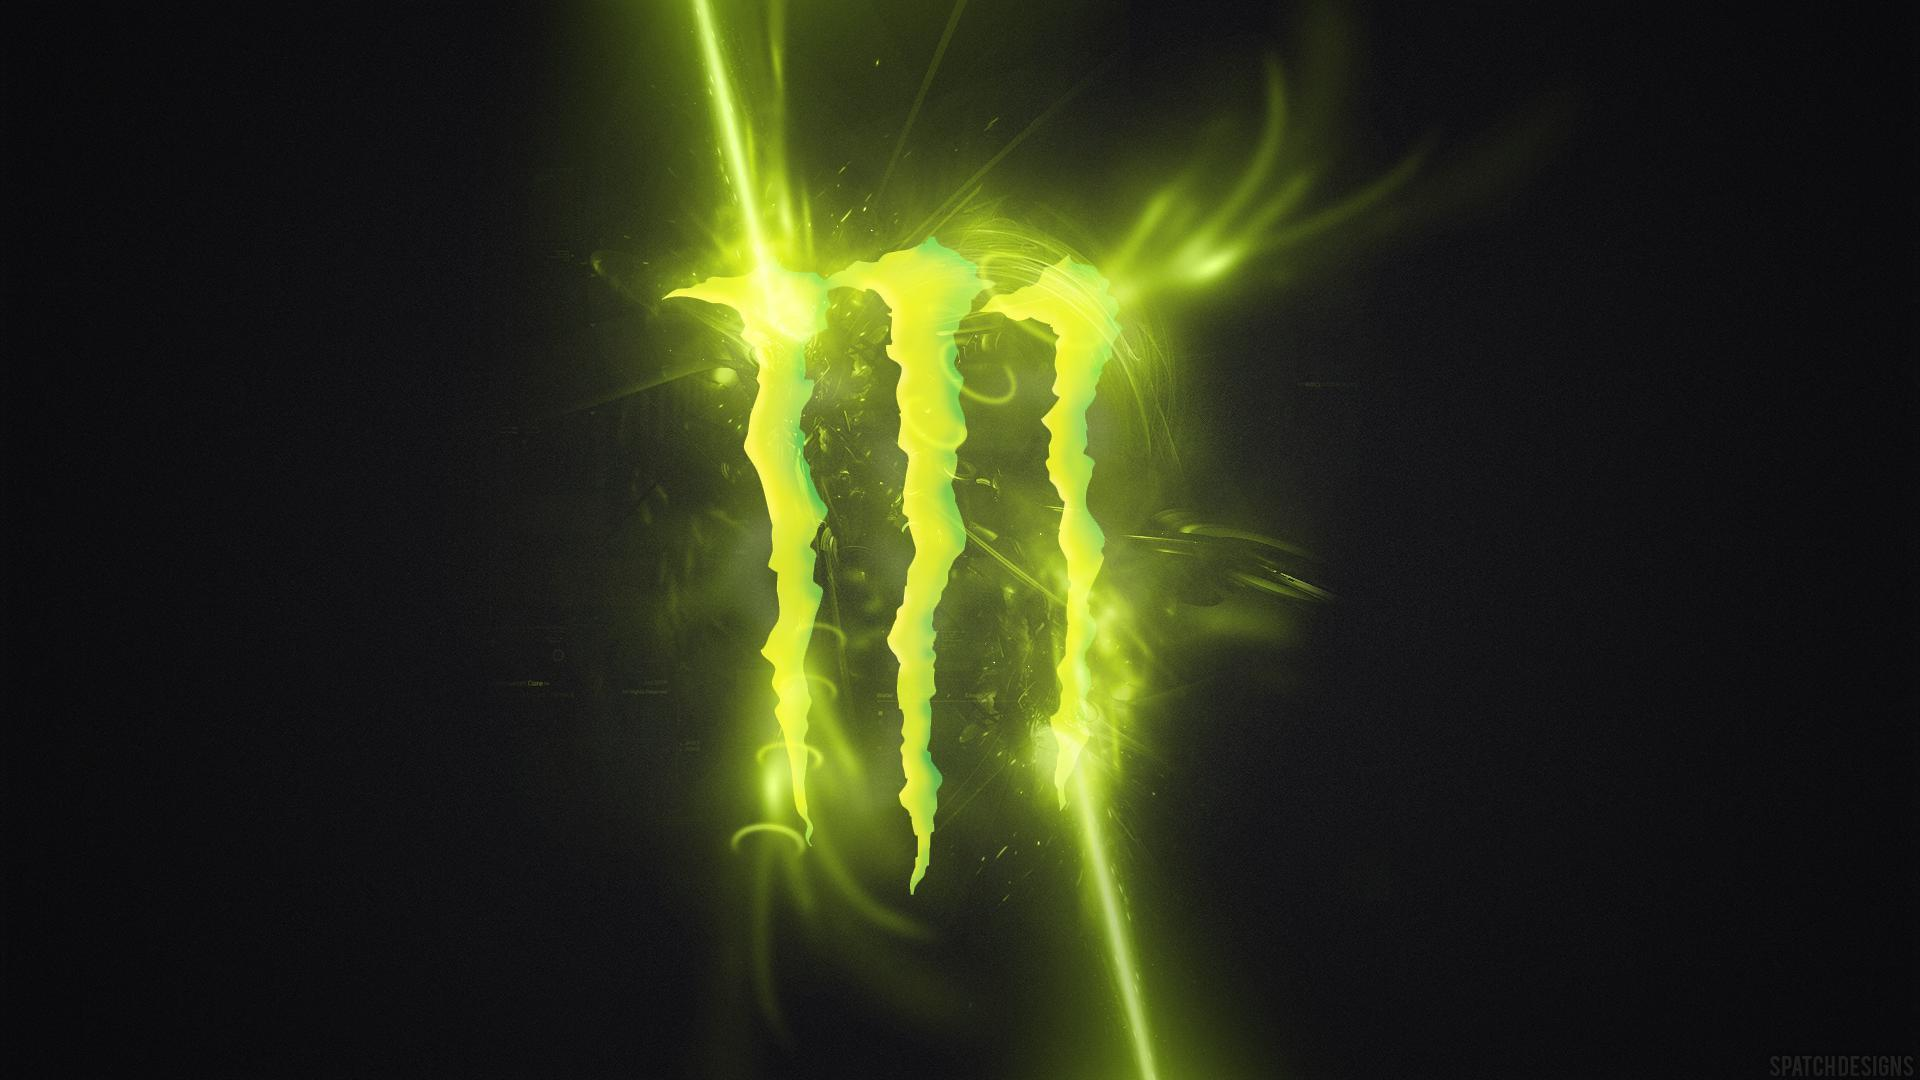 Monster energy hd wallpaper impremedia monster energy wallpapers 2015 hd amxxcs voltagebd Choice Image